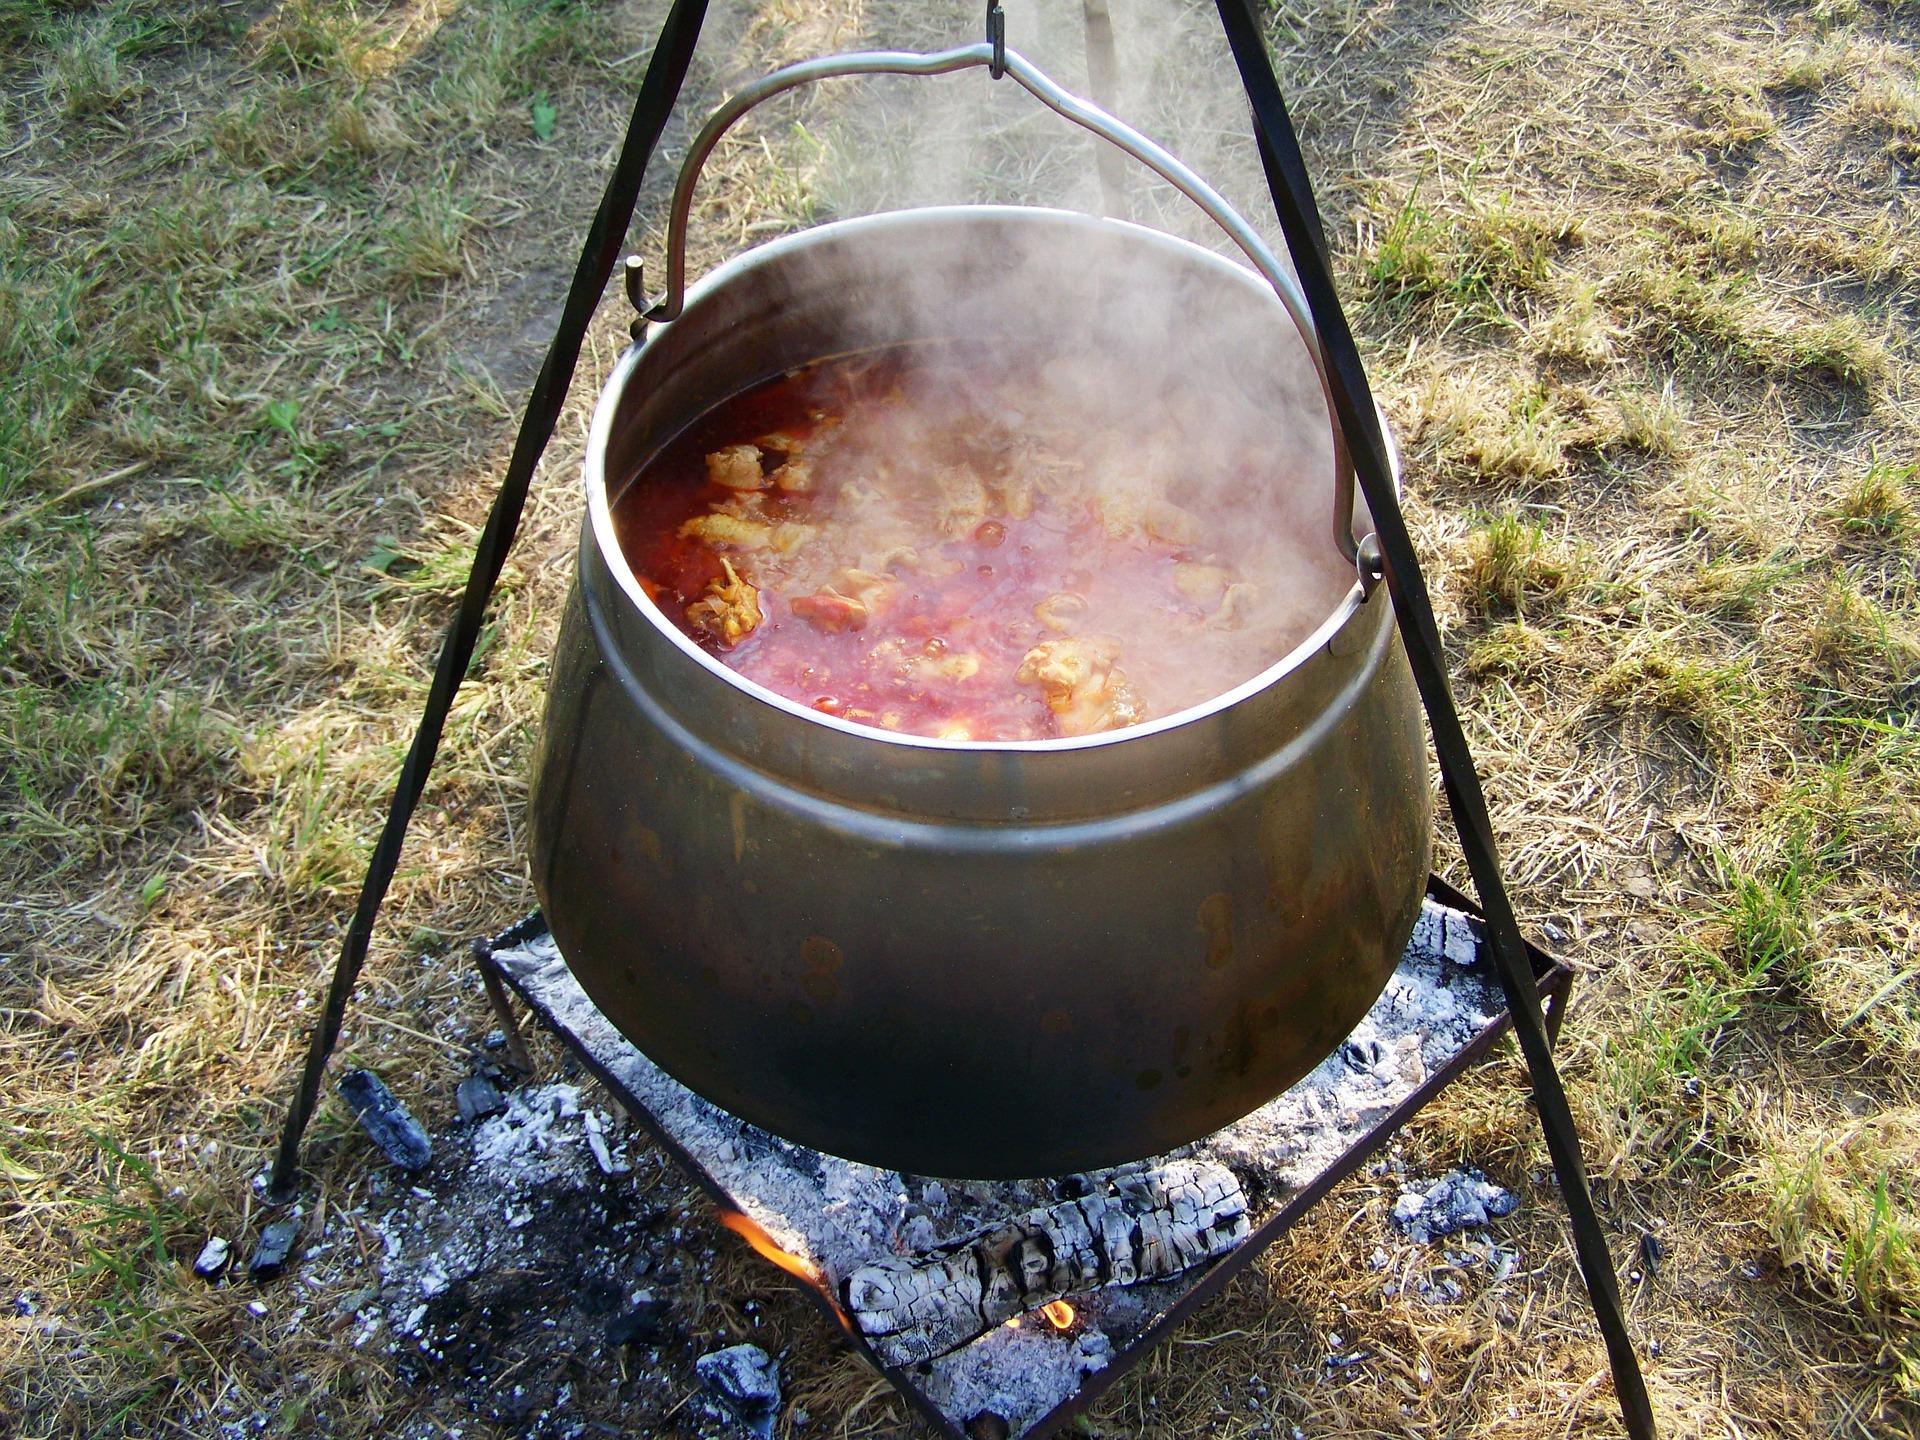 kettle-goulash-1645207_1920